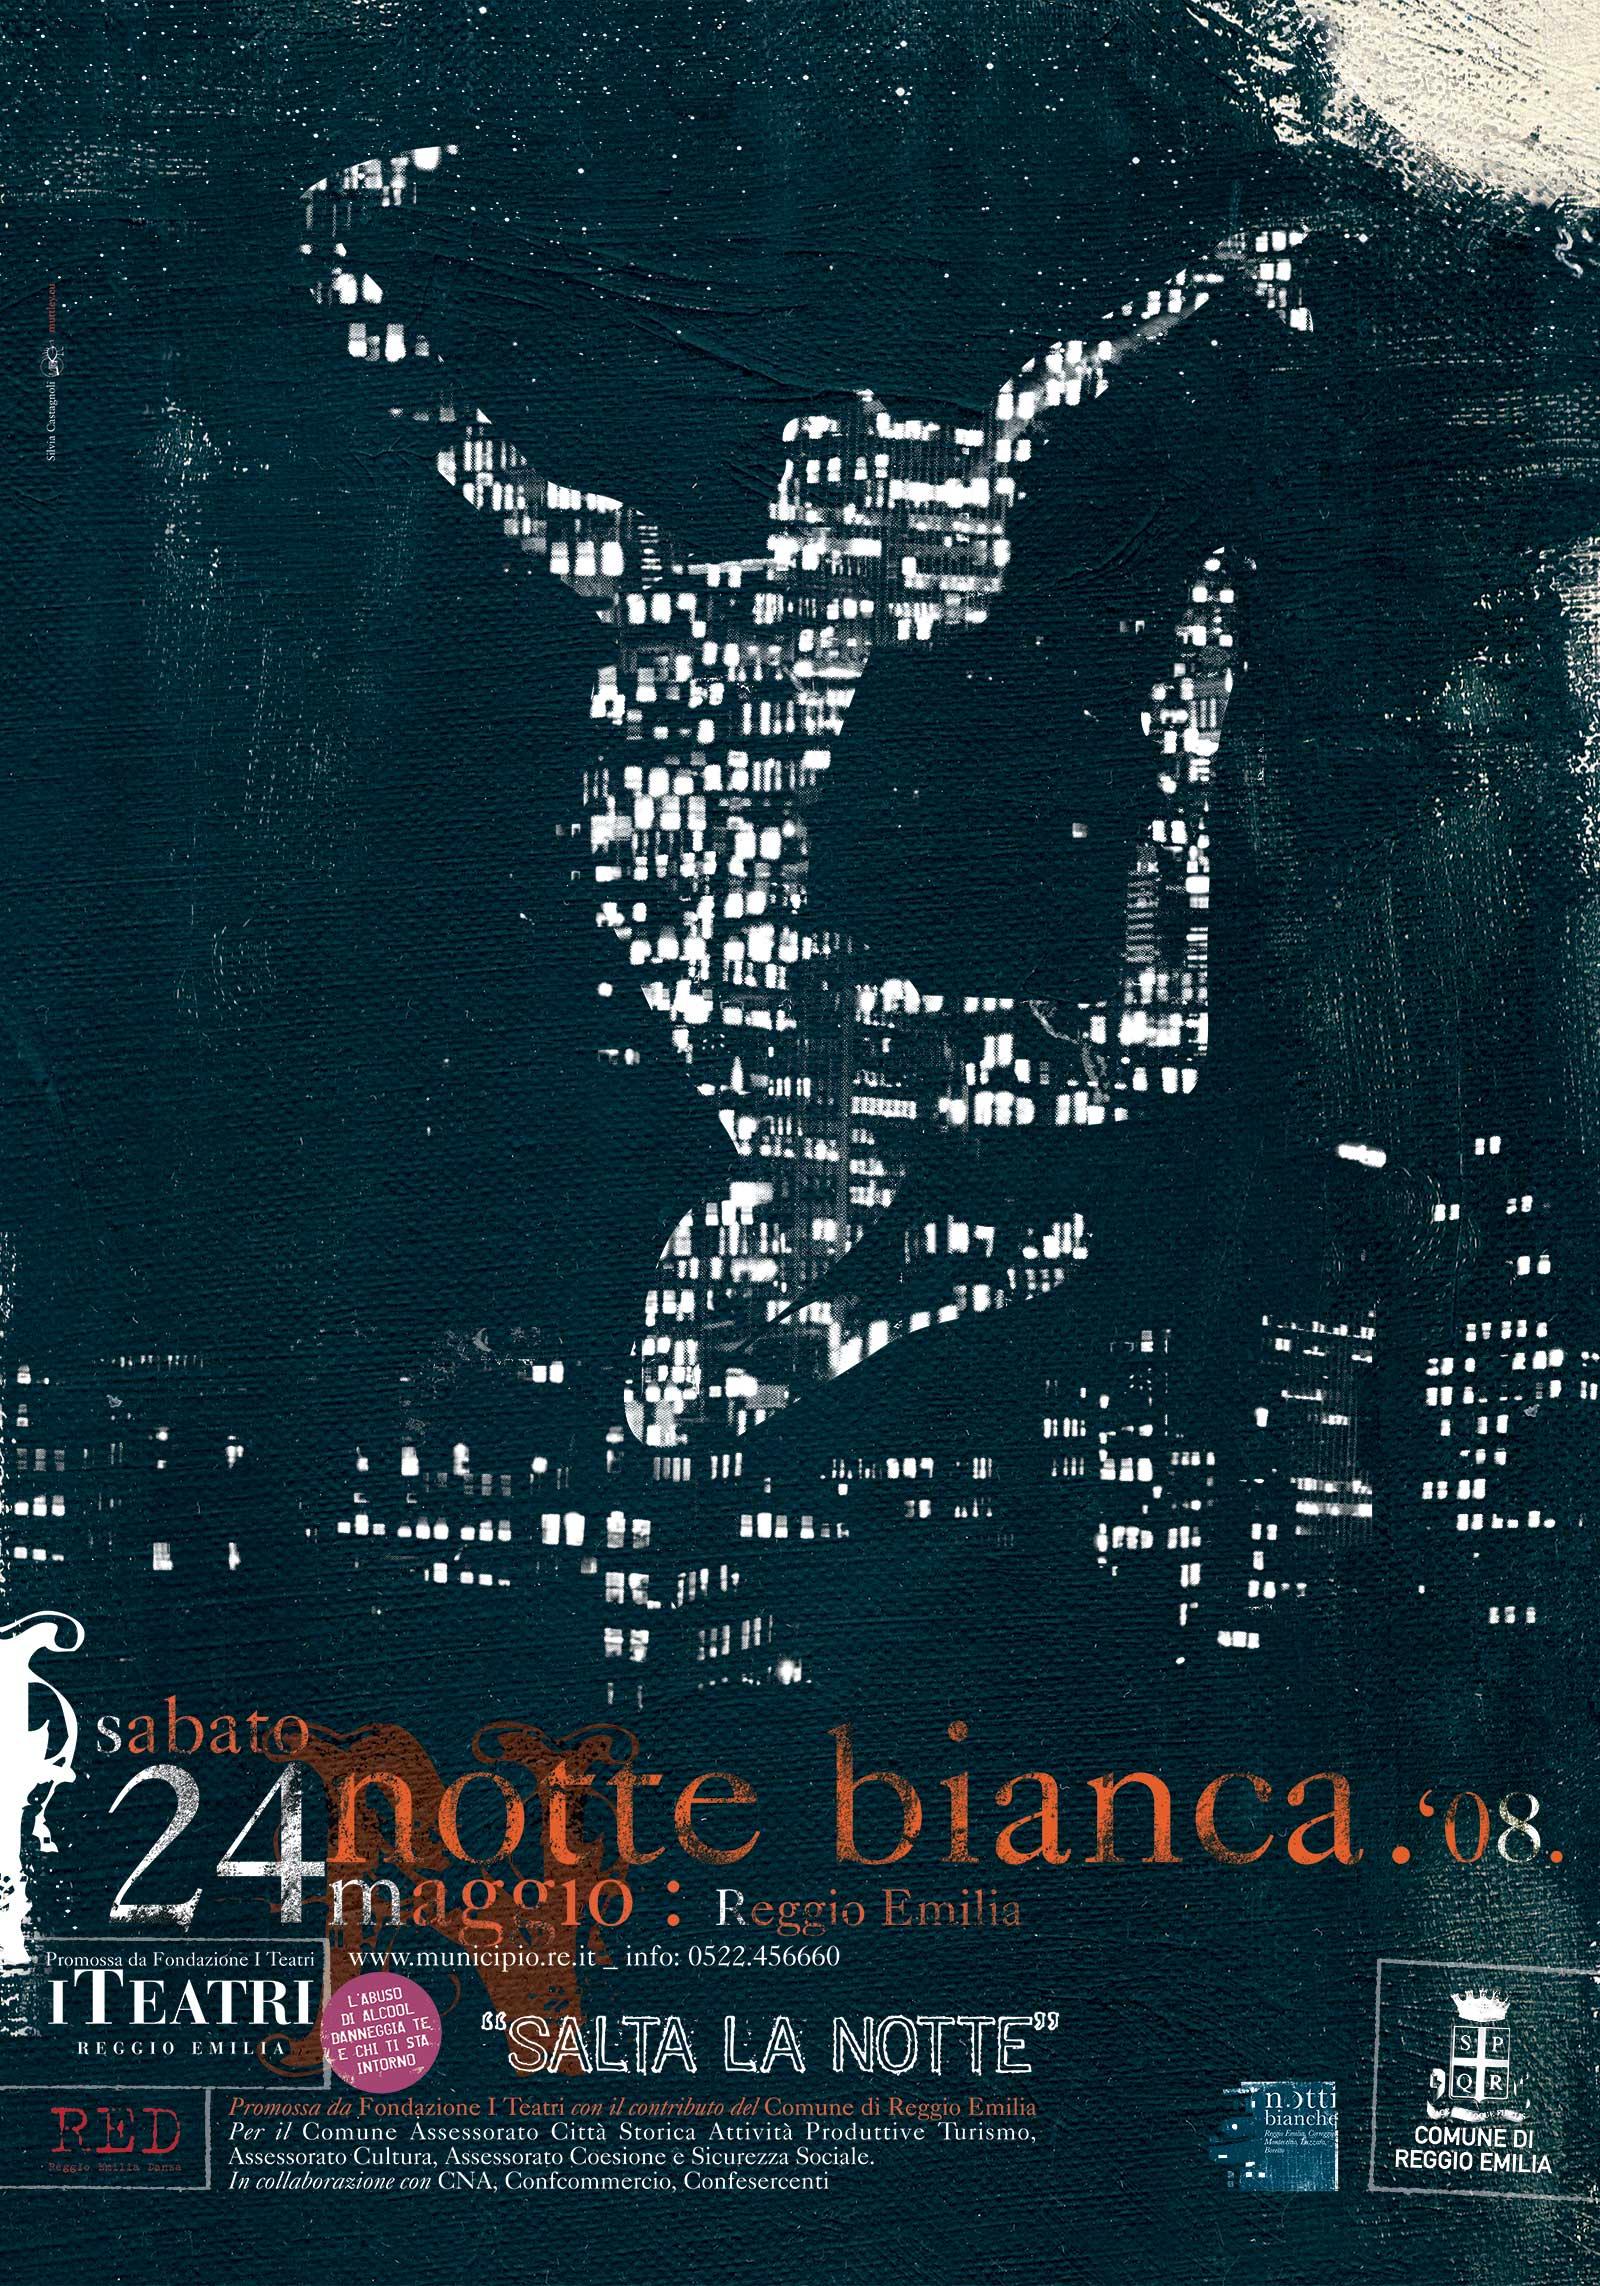 NOTTE-BIANCA-2008_manifesto